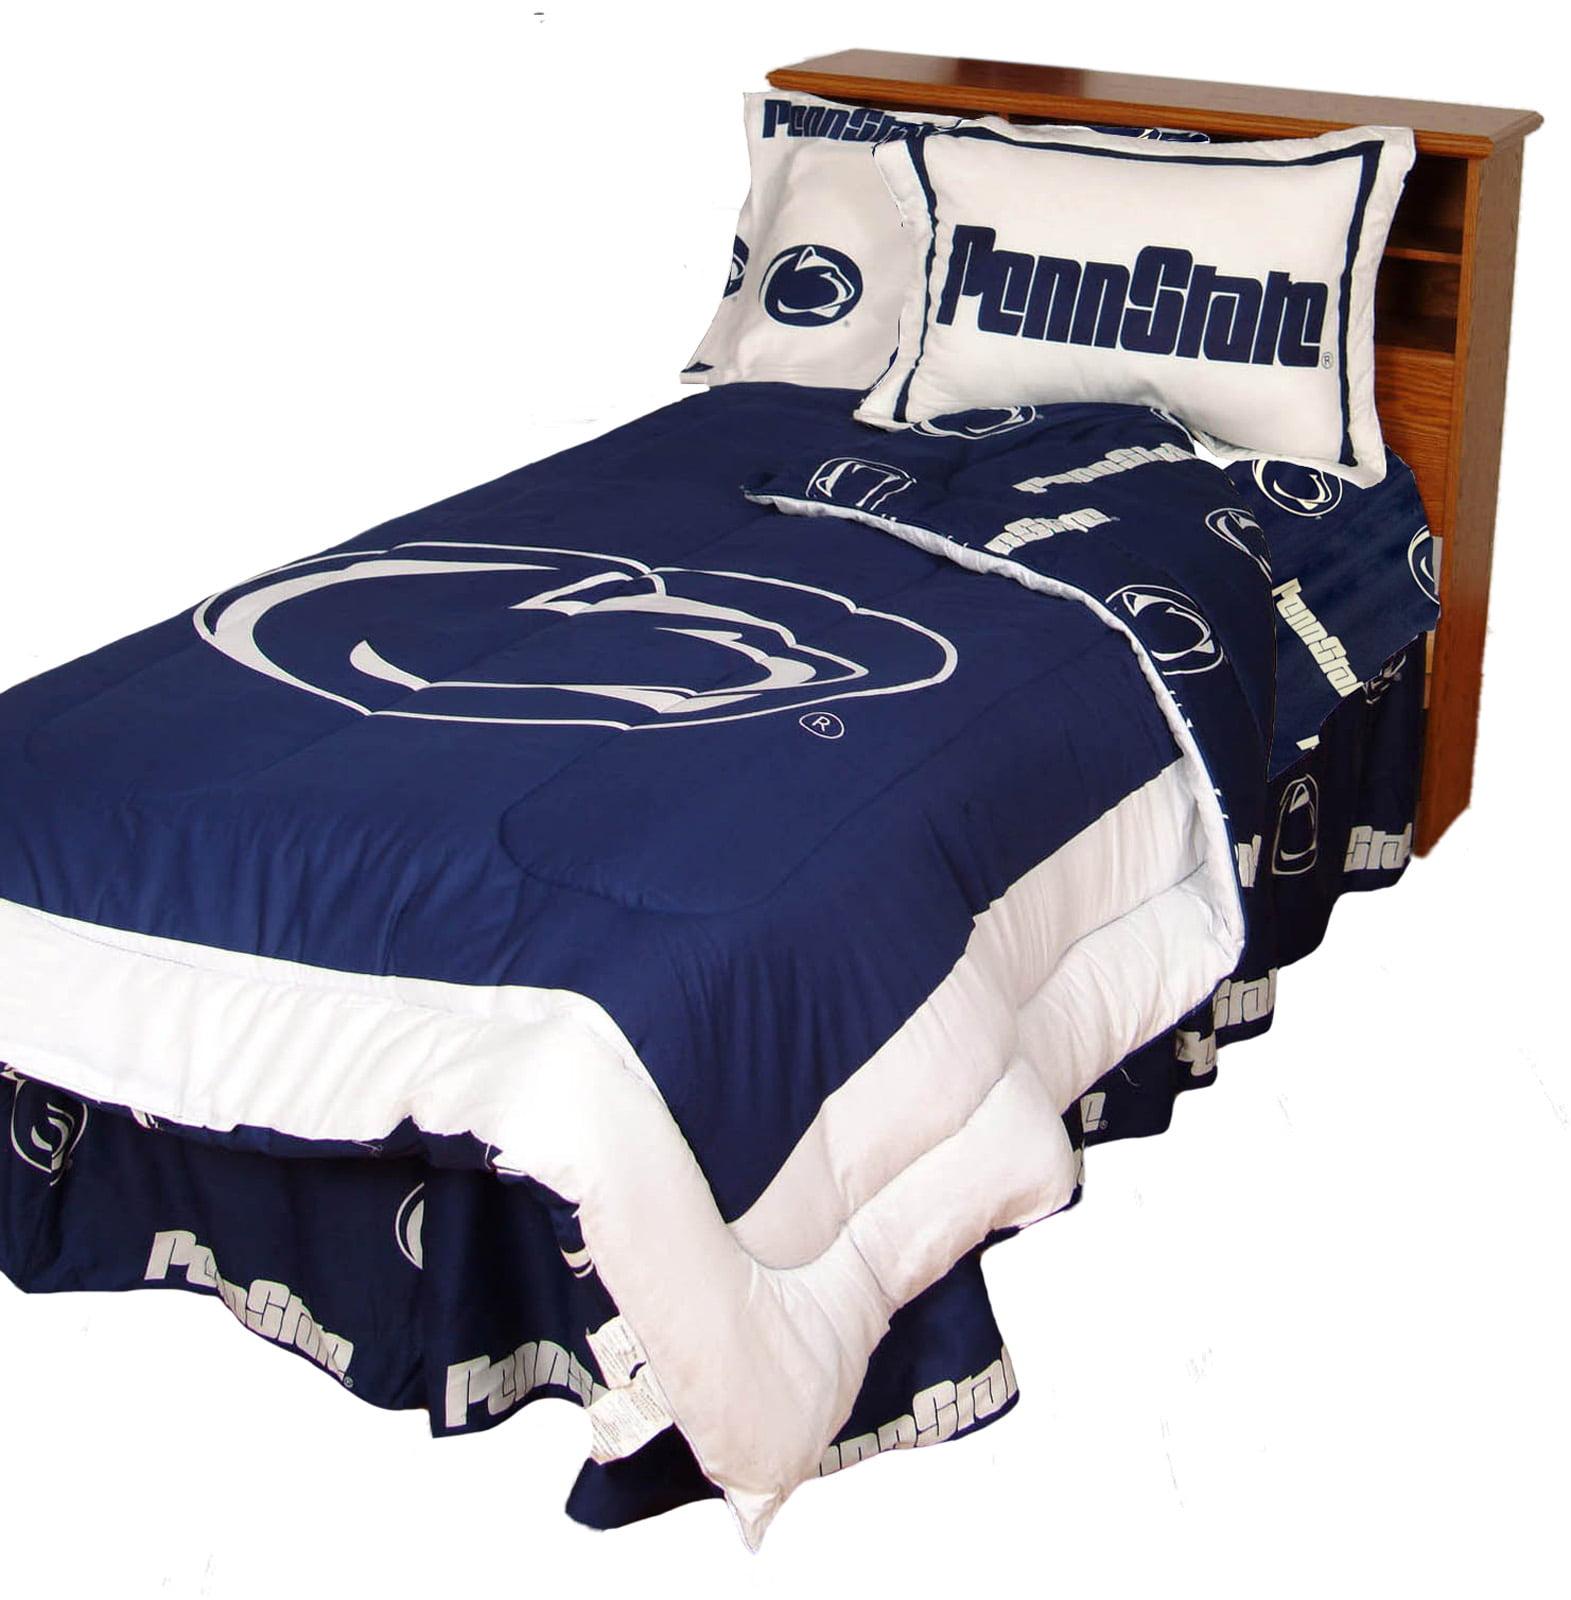 Penn State Nittany Lions 2 Pc Comforter Set, 1 Comforter, 1 Sham, Twin